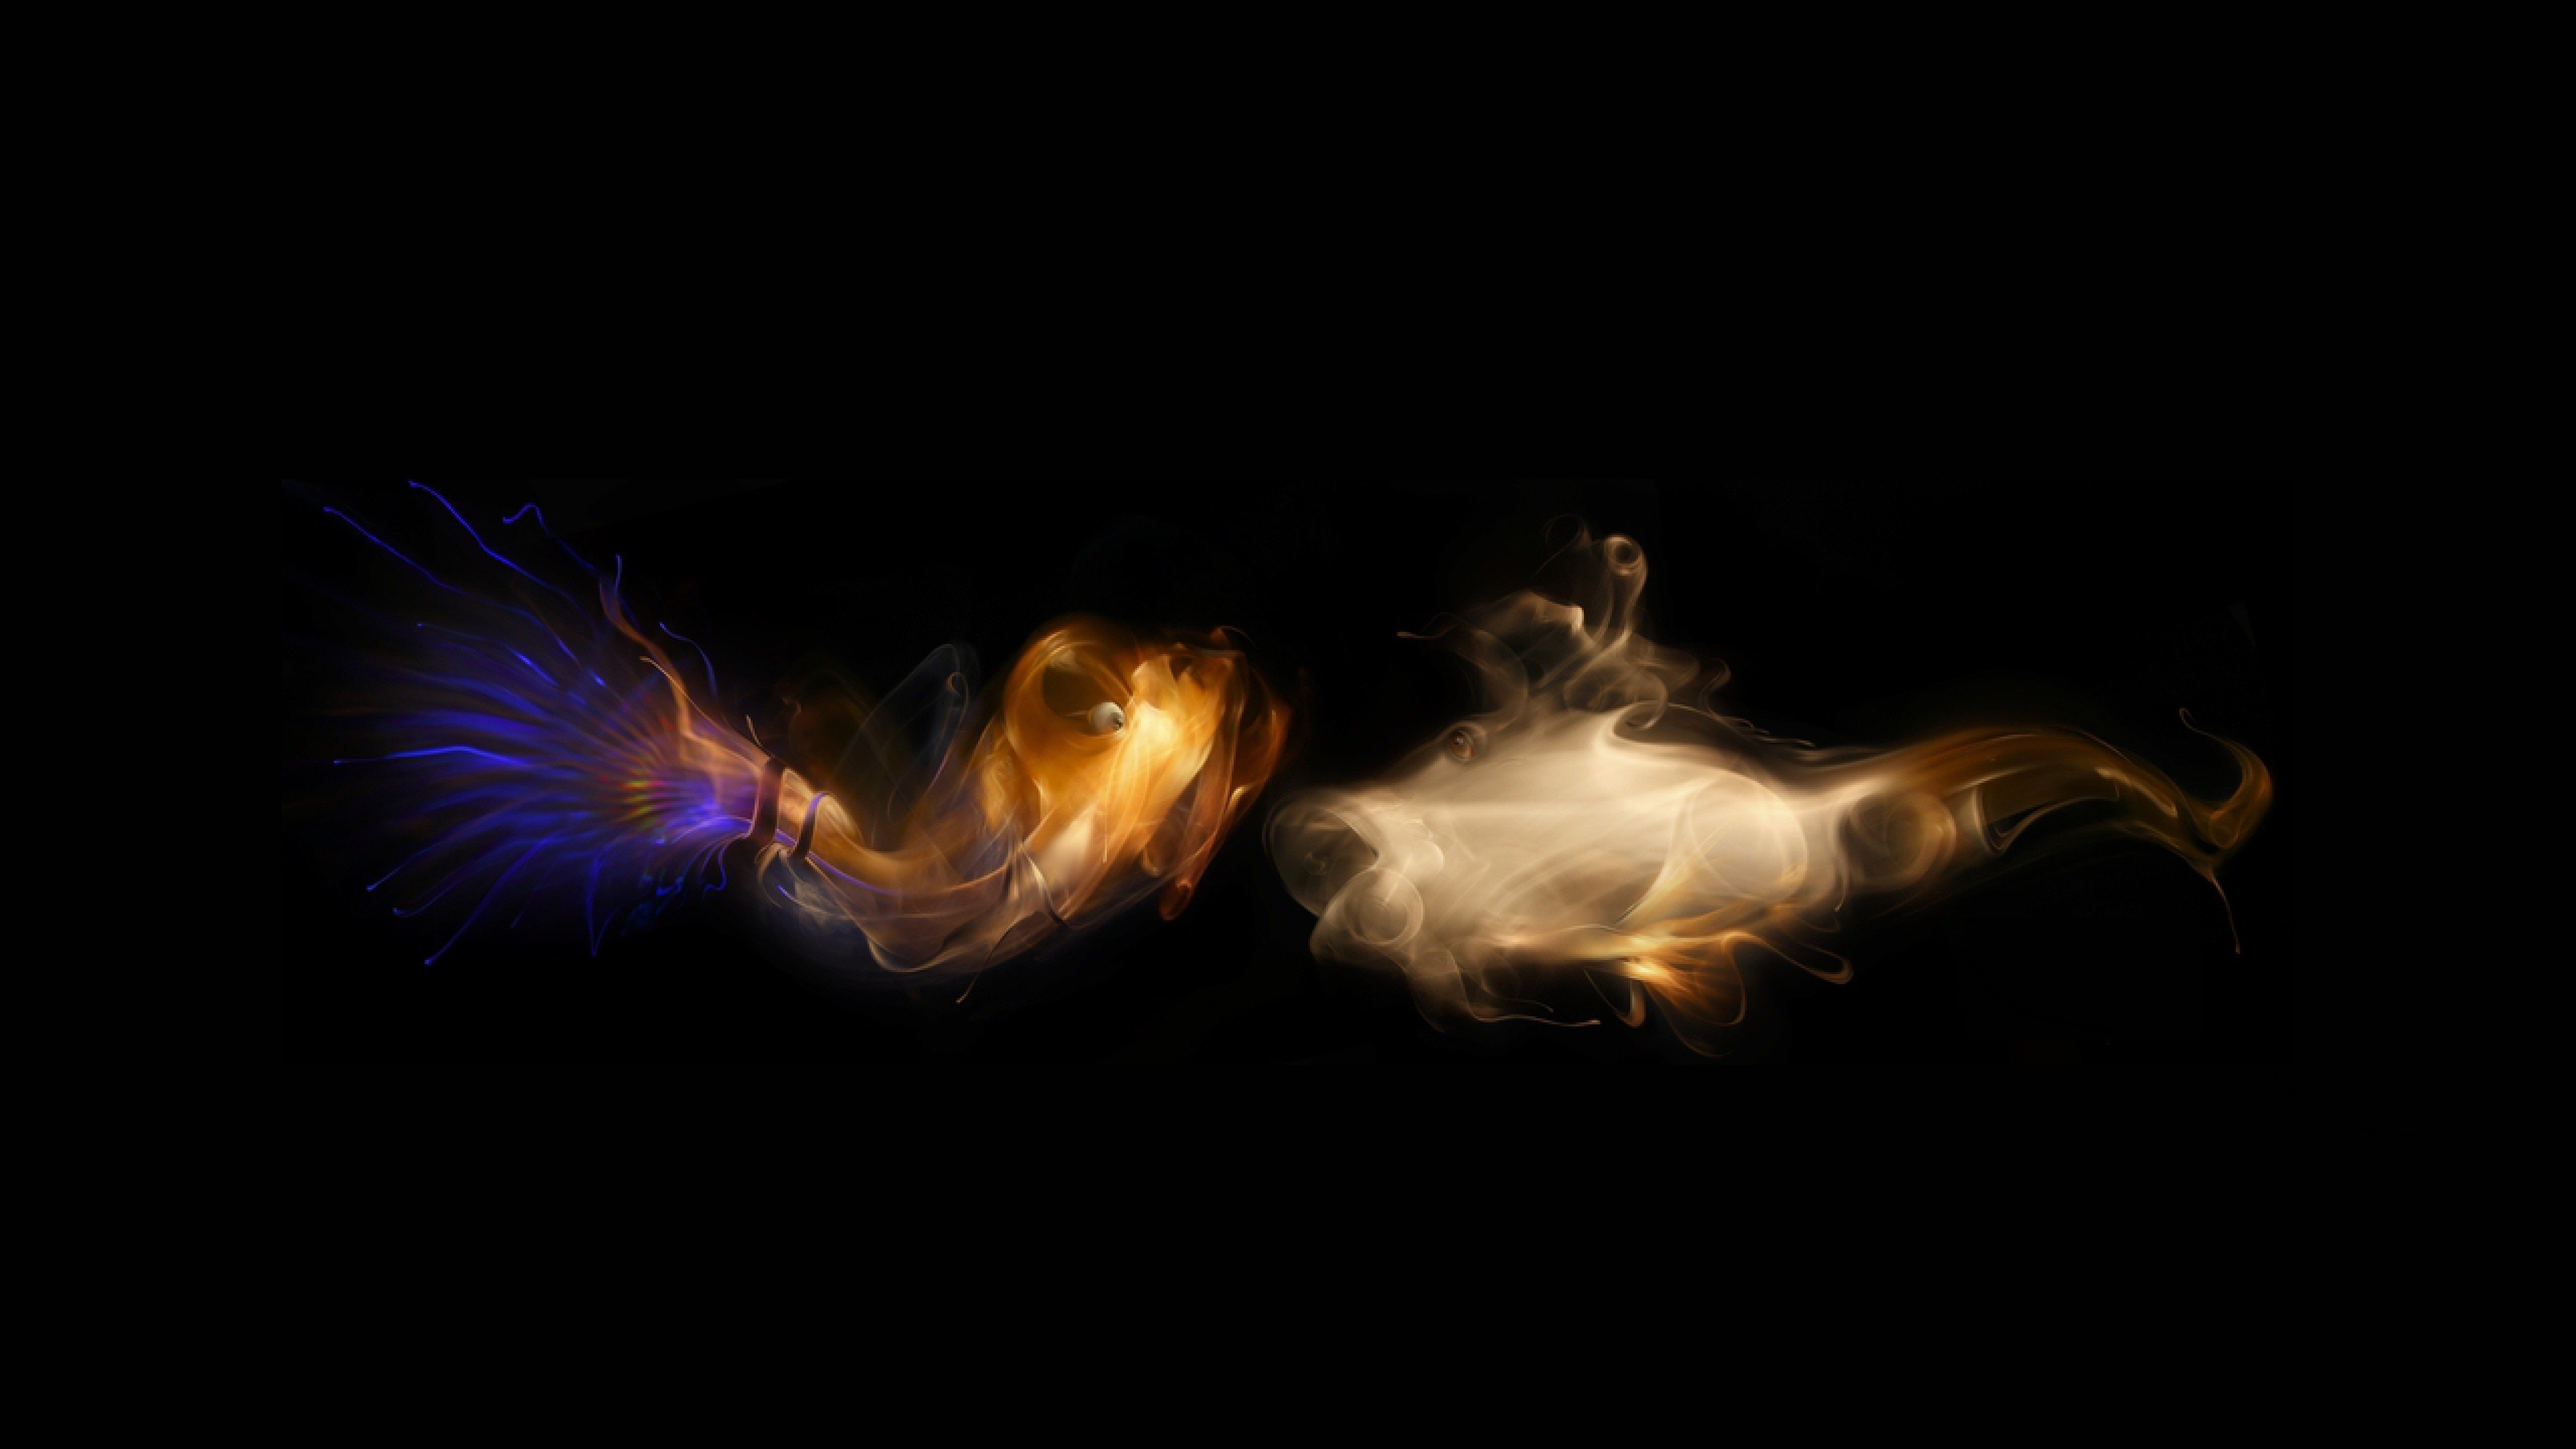 smoke backgrounds free download   pixelstalk